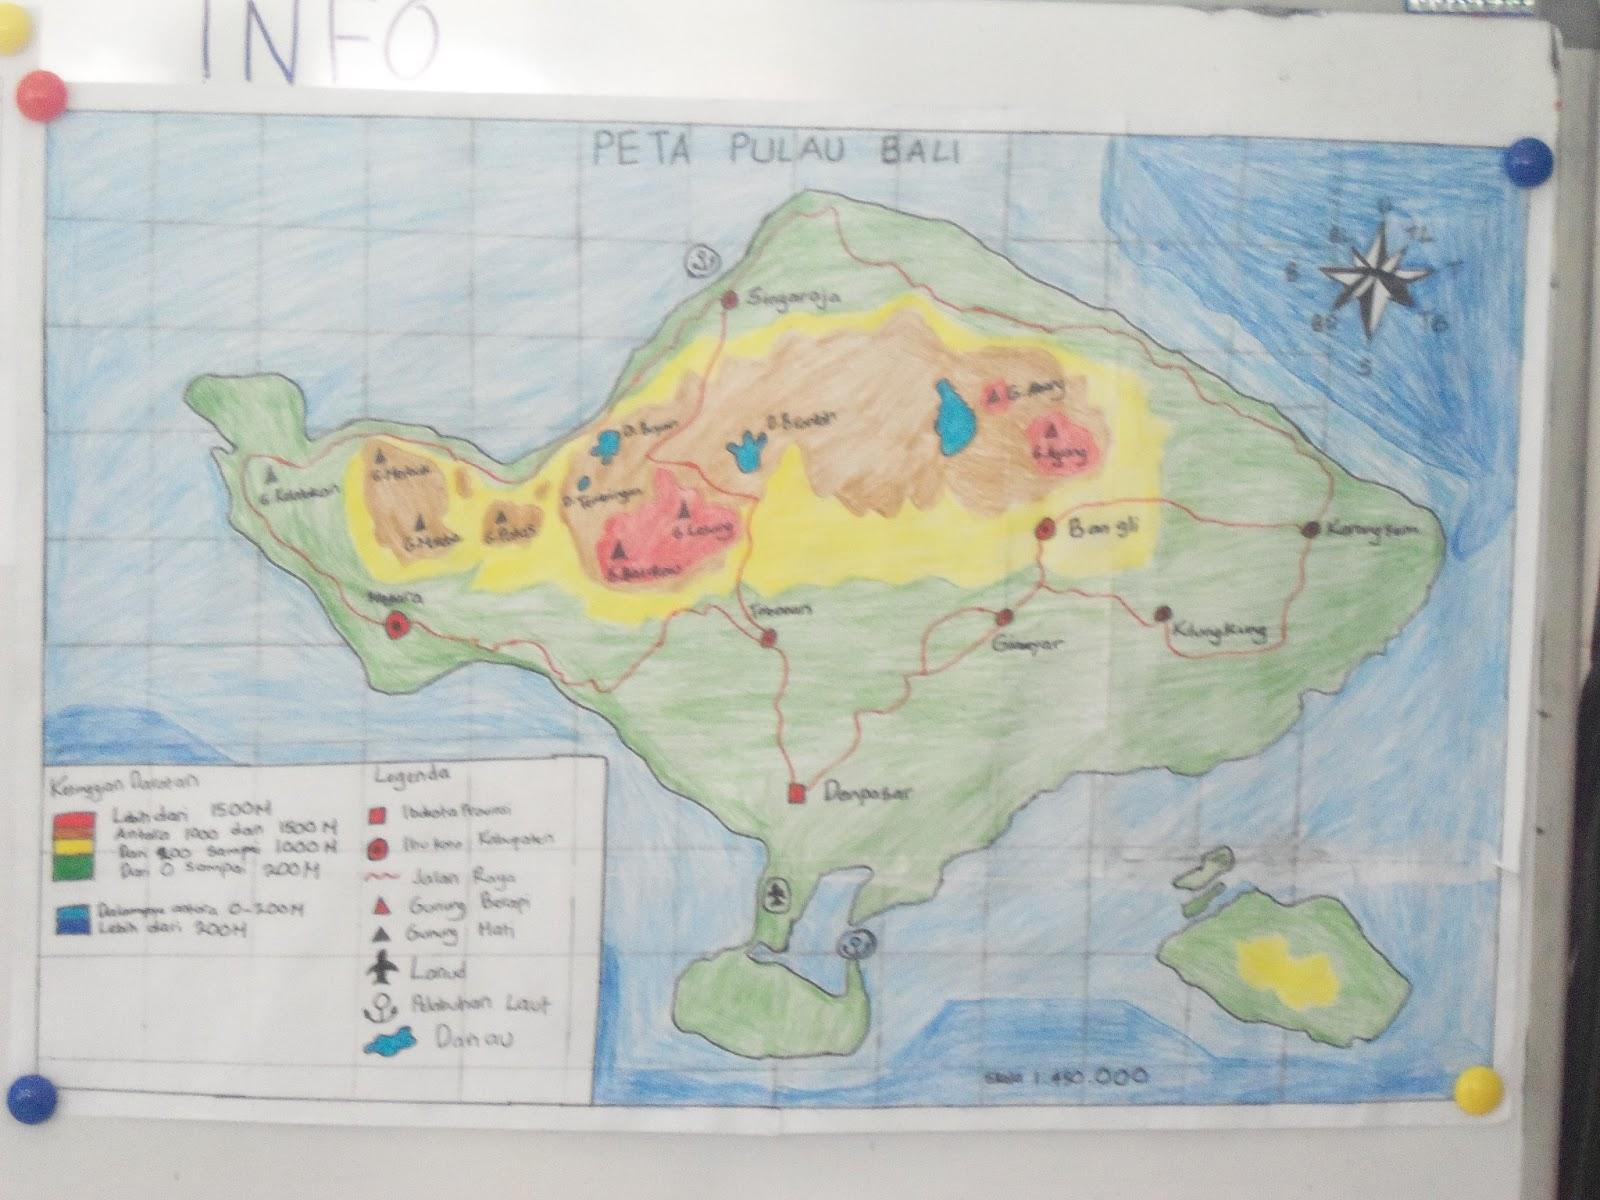 Peta Disuruh Membuat Pulau Bali Menurut Guru Mudah Digambar Diharuskan